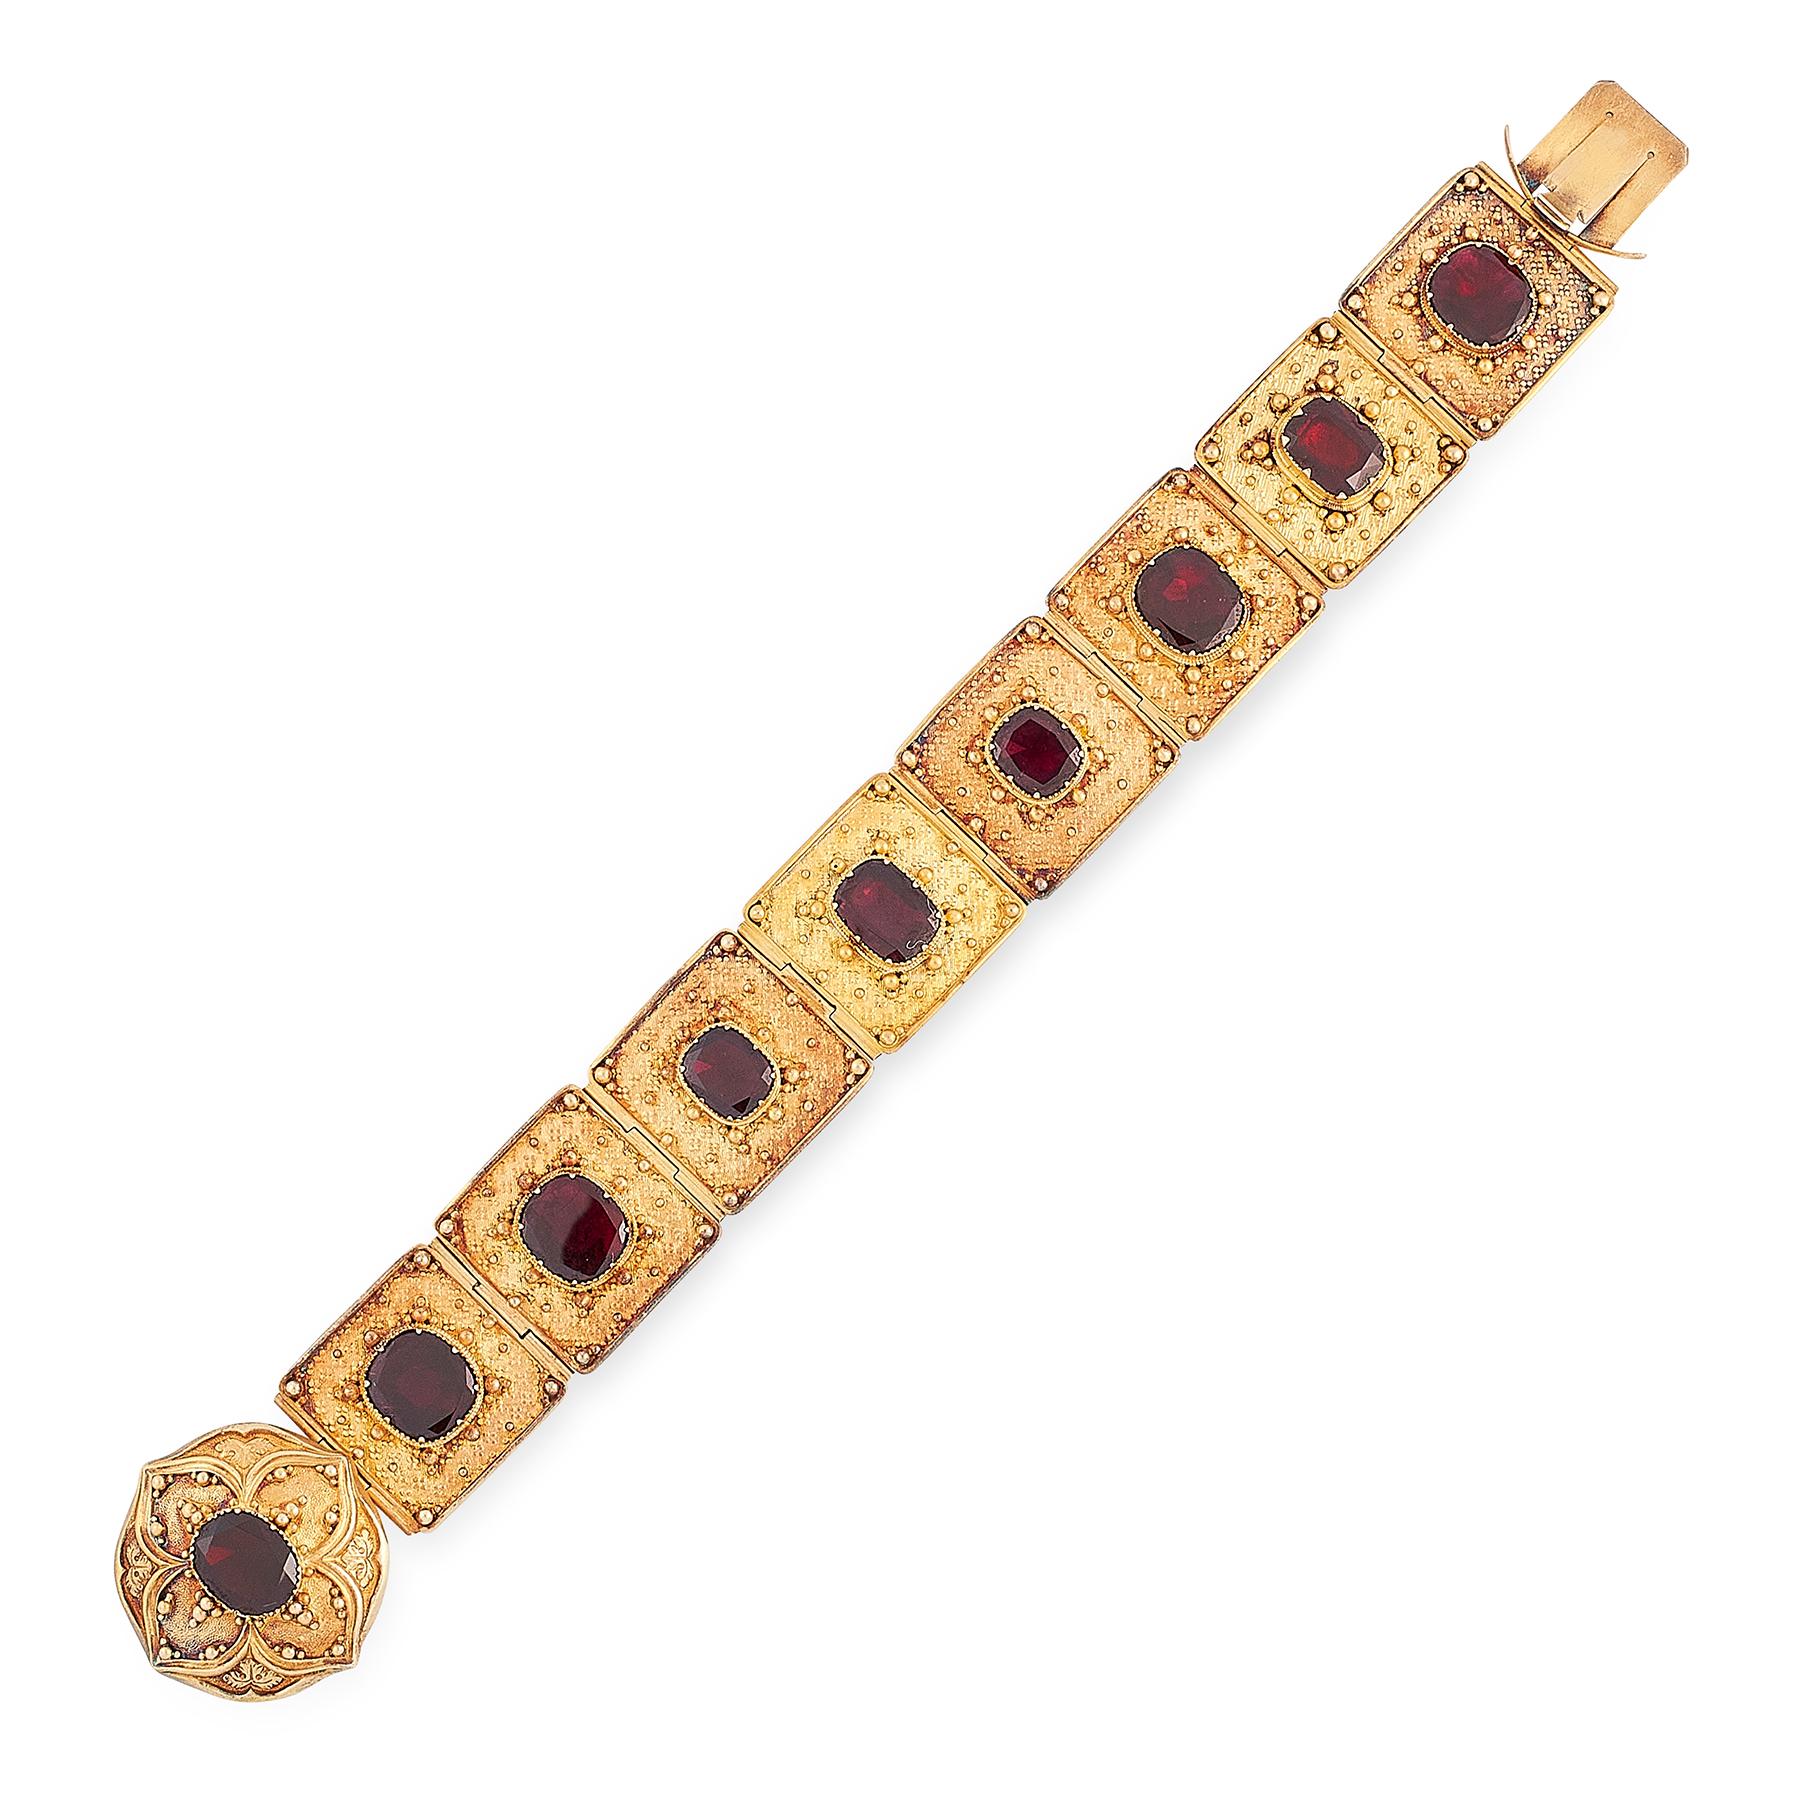 AN ANTIQUE GARNET BRACELET, 19TH CENTURY in high carat yellow gold, formed of eight rectangular